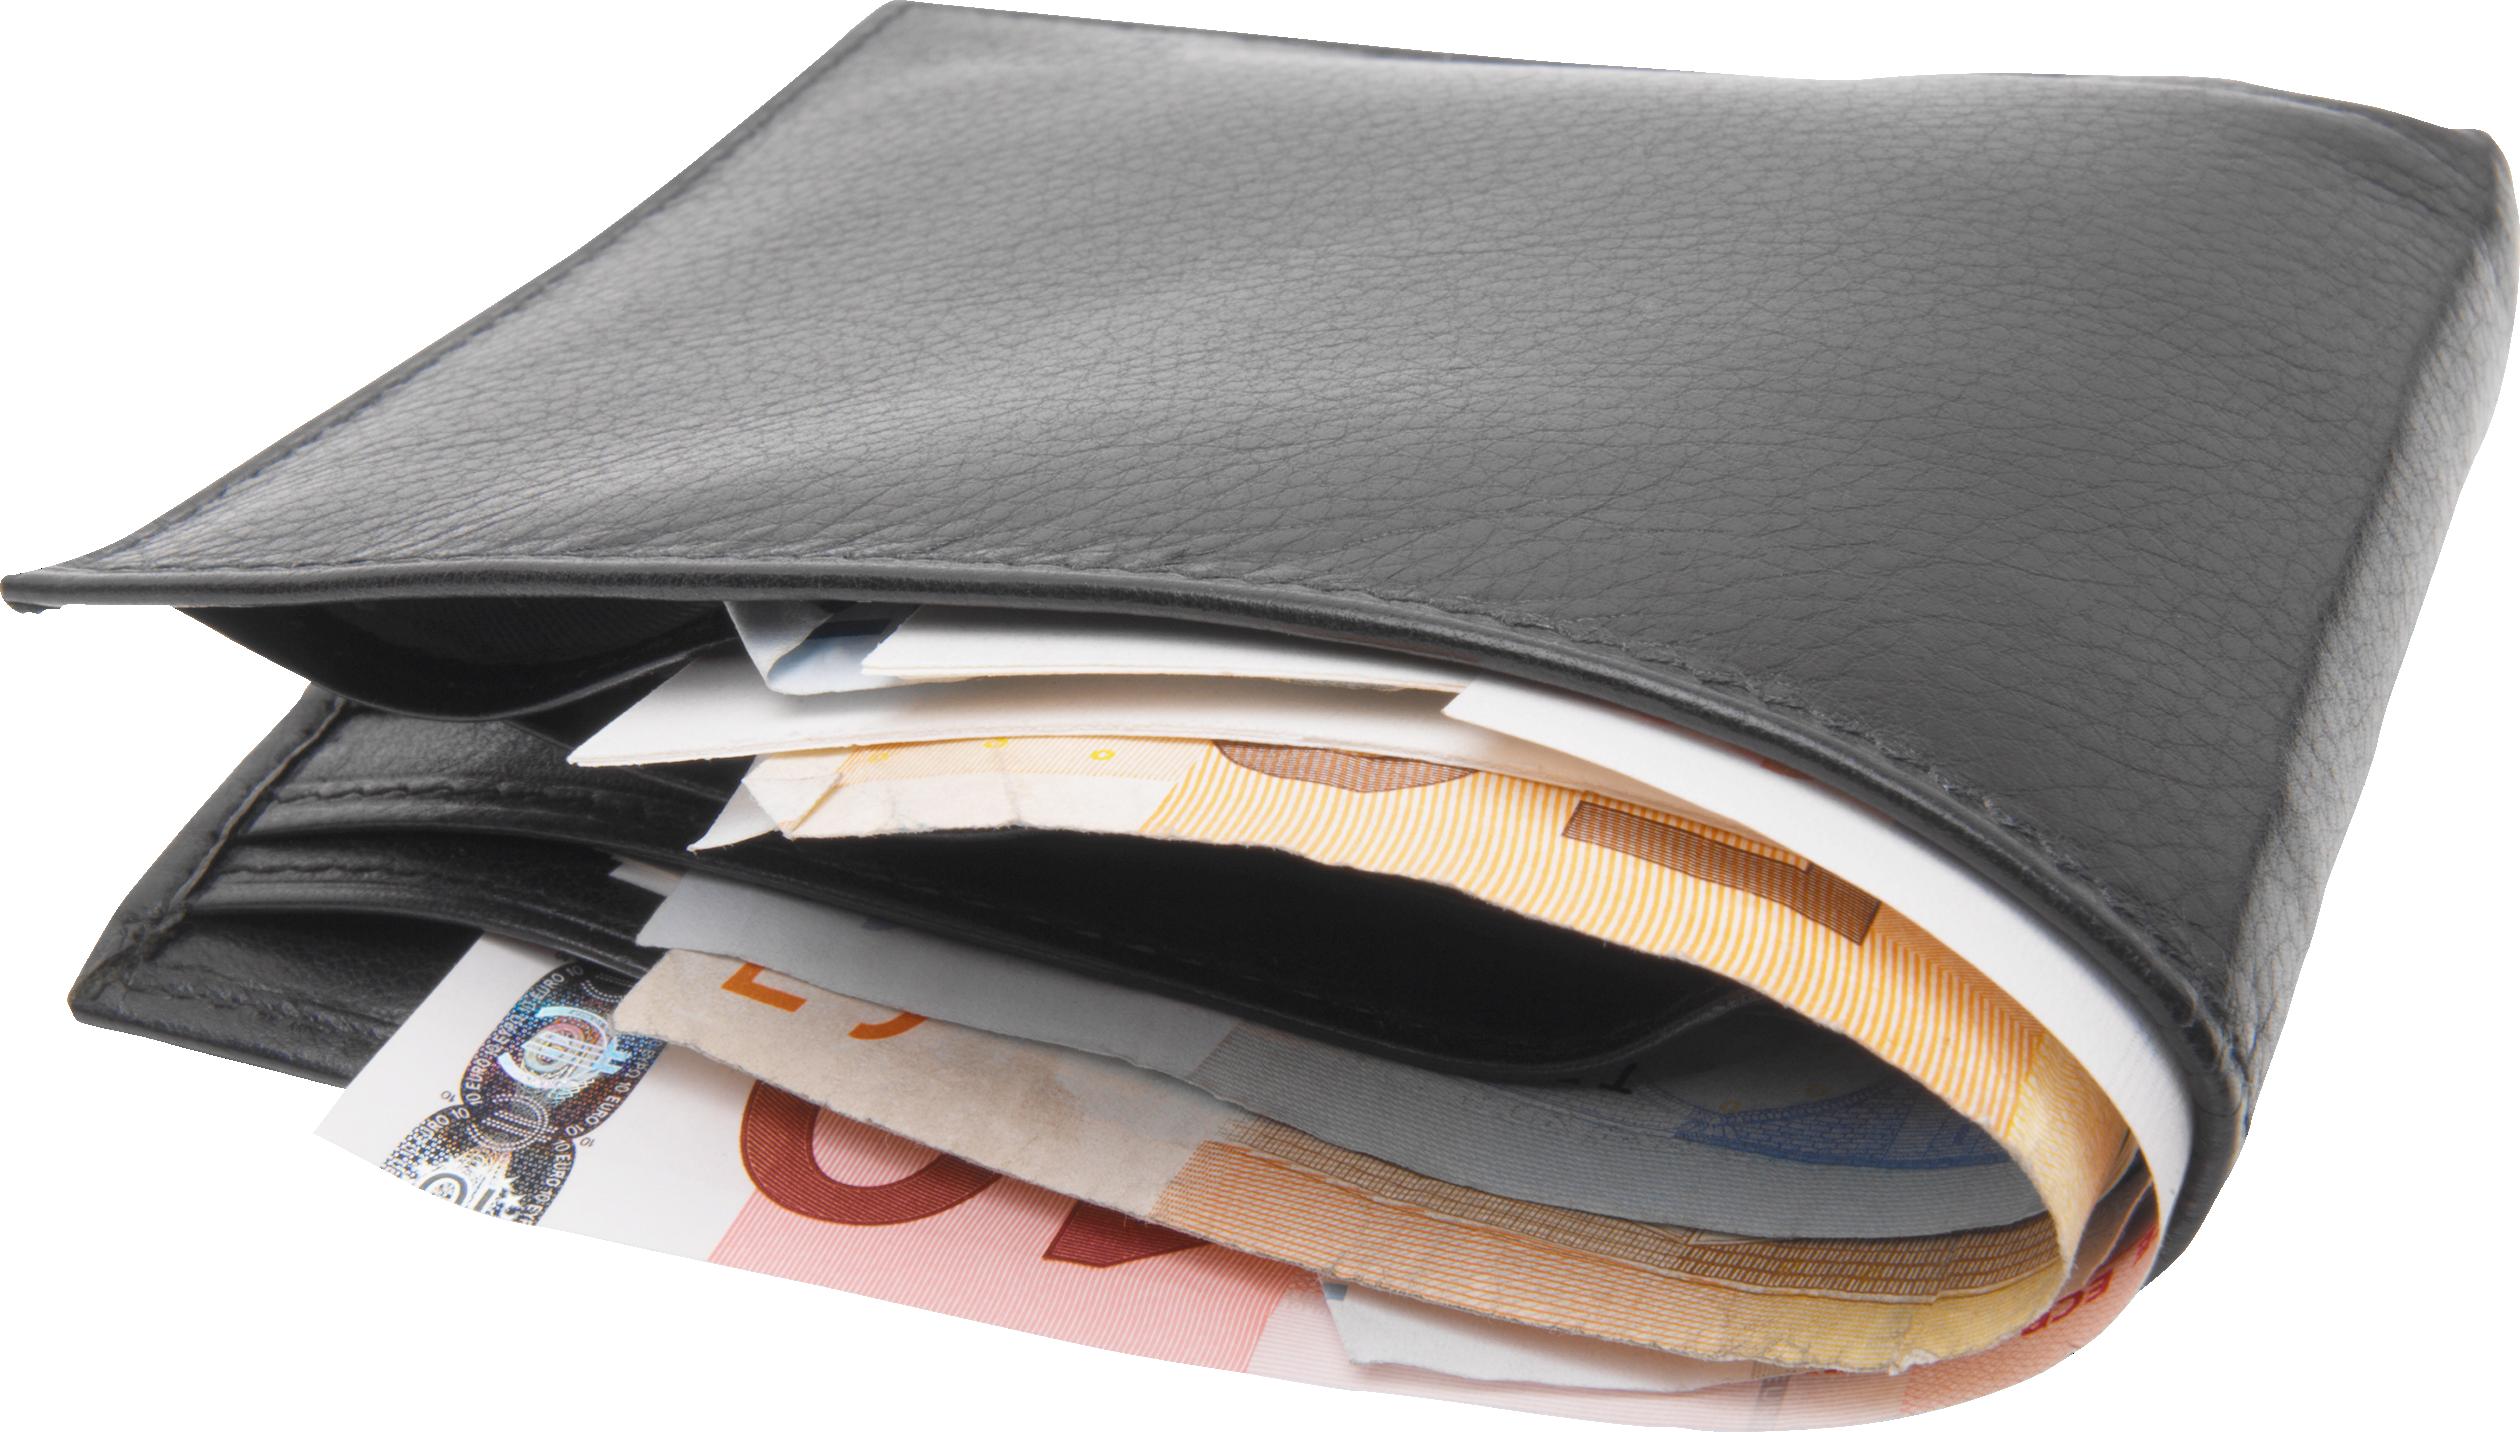 Wallet HD PNG - 96565